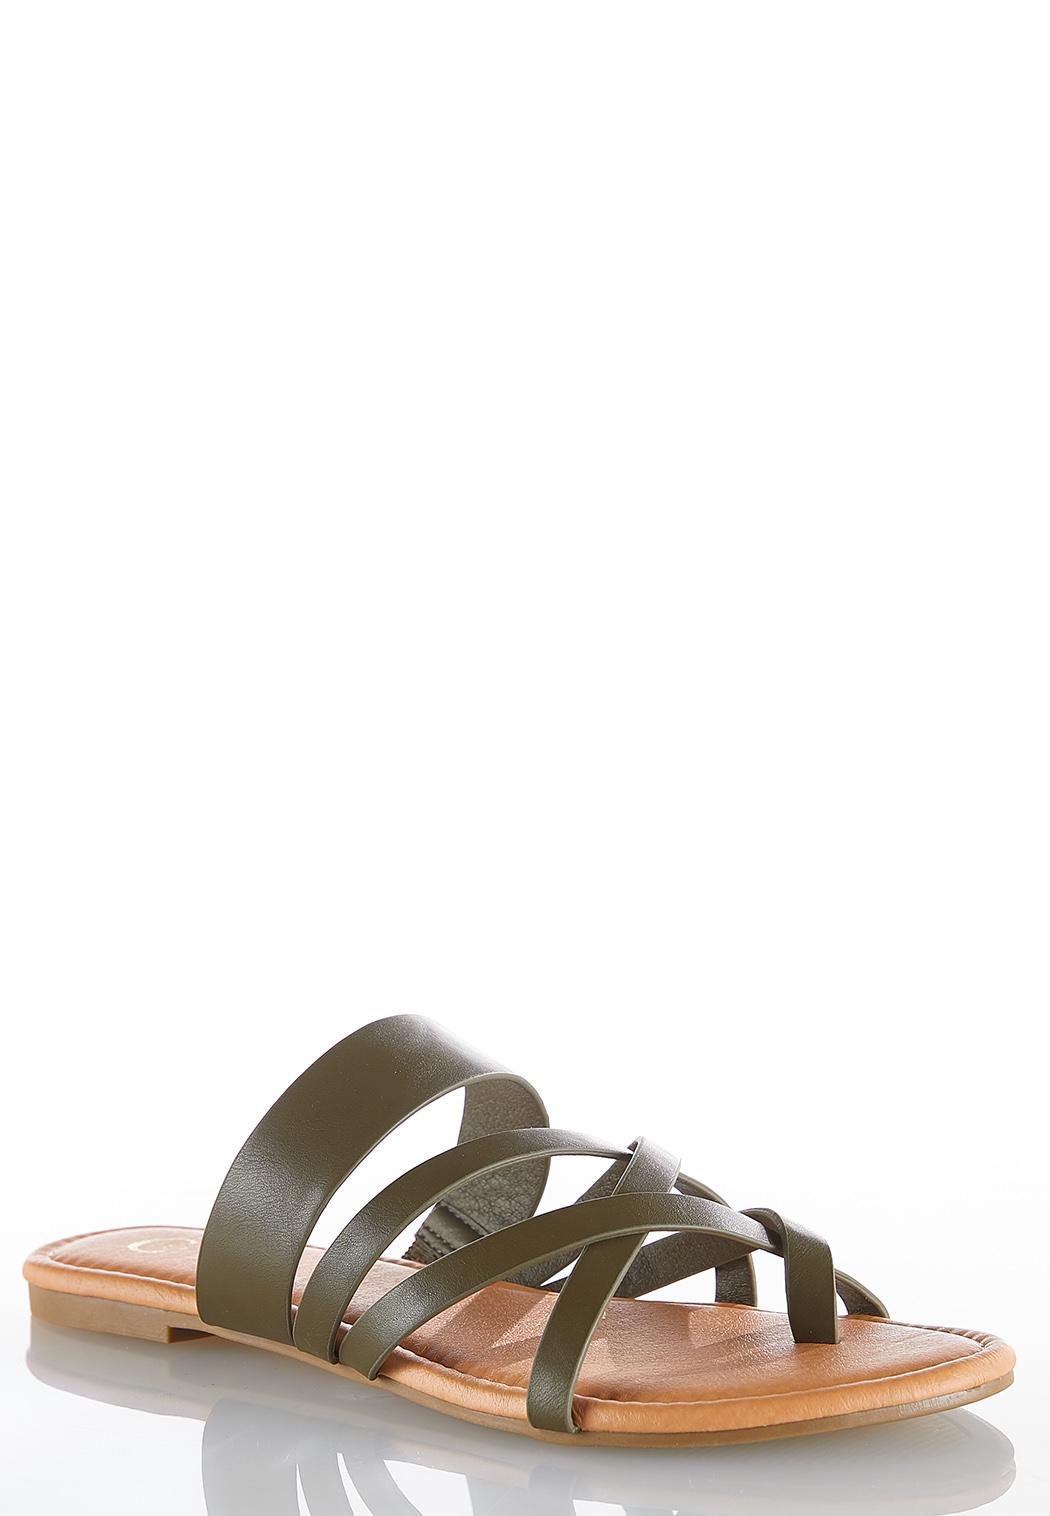 Cross Strap Toe Loop Sandals